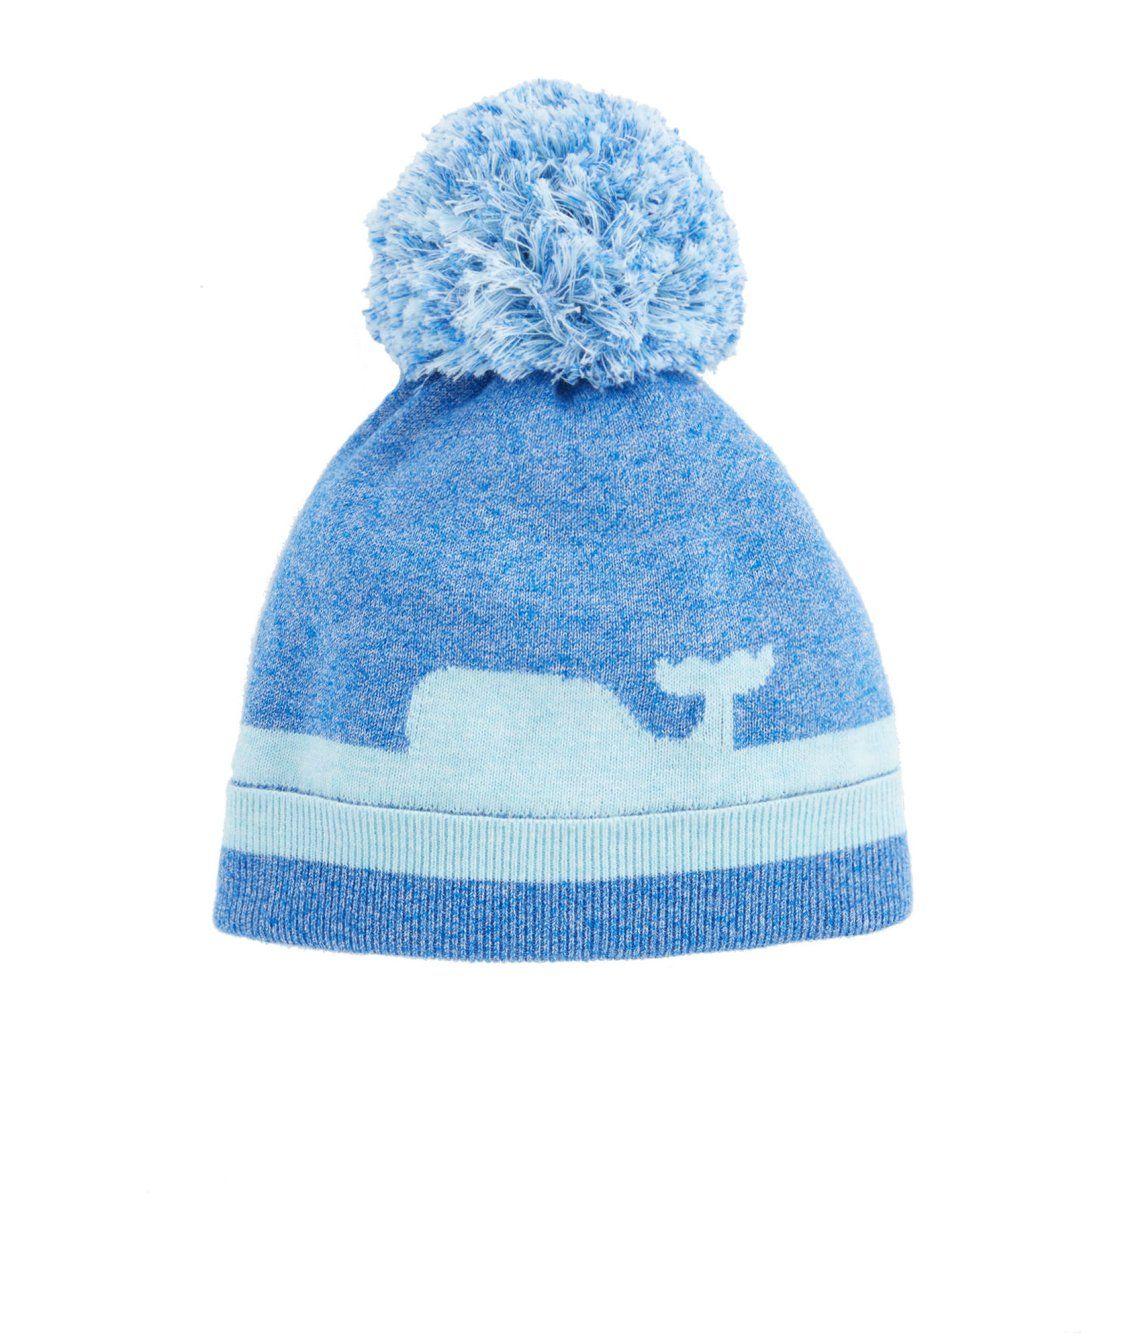 Girls Whale Knit Hat  e74c195a9858